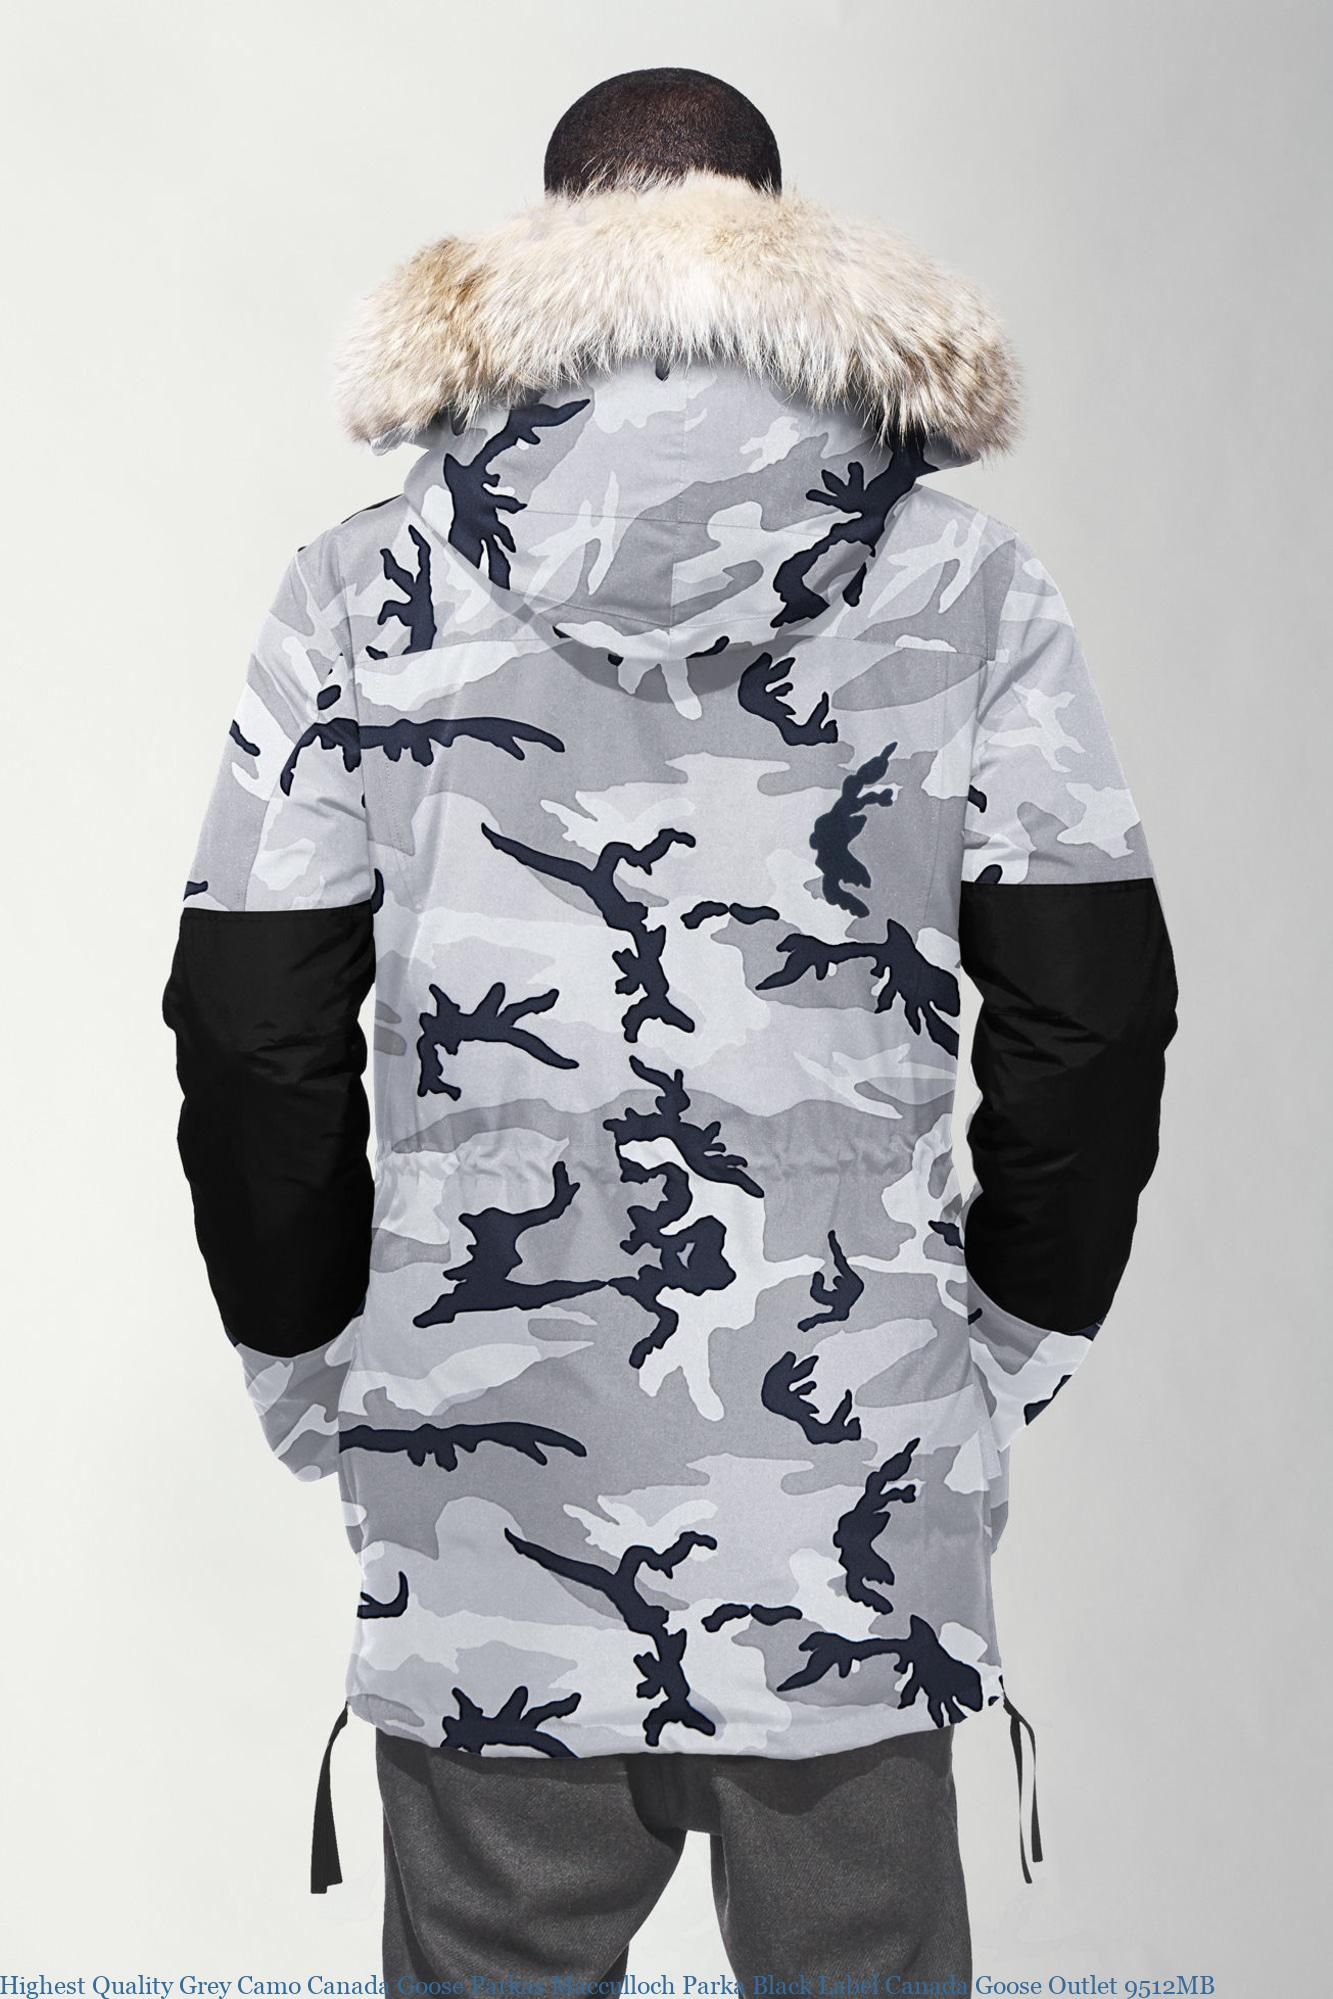 Canada Goose Men's Macculloch Parka